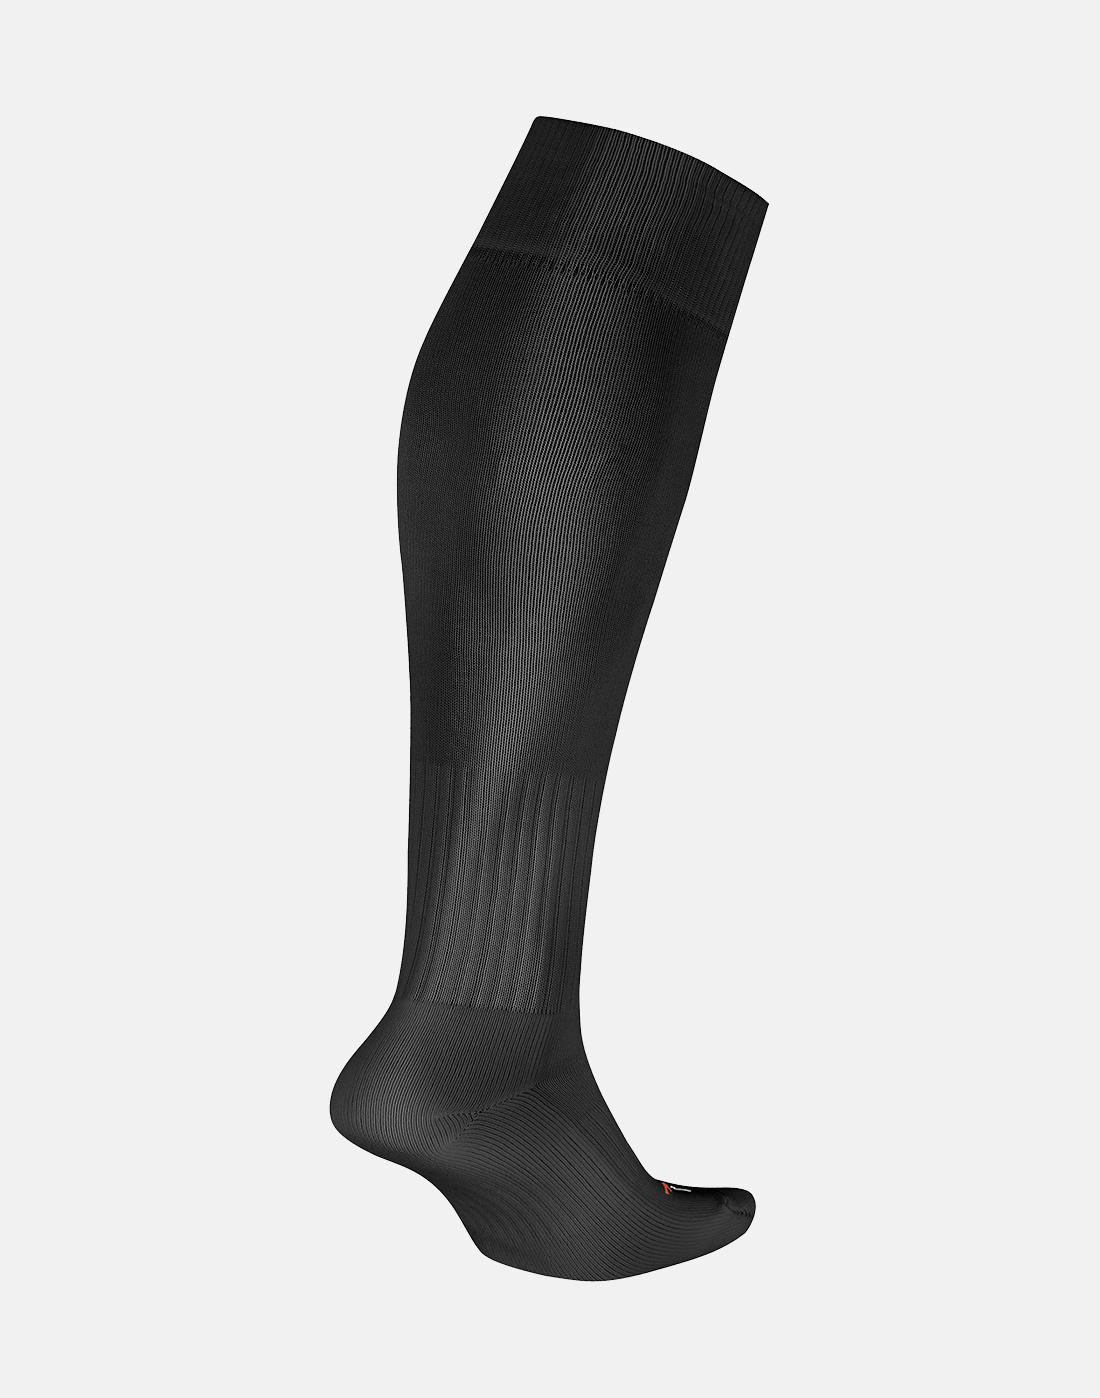 e1b21d78983d73 Nike Adult Classic Dri-Fit Football Sock